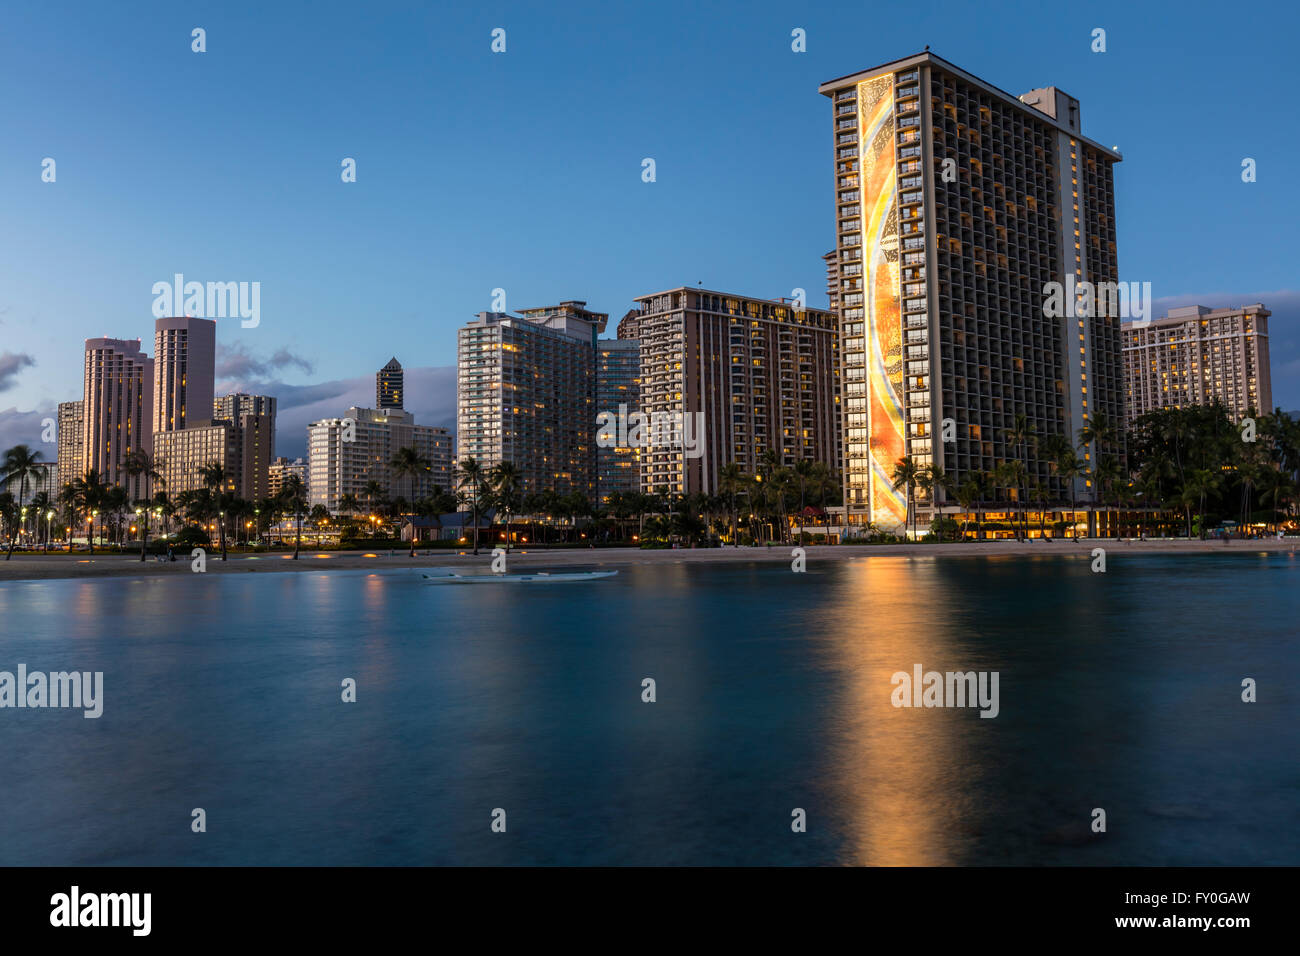 A View Of The Hilton Hawaiian Village Waikiki Beach Resort